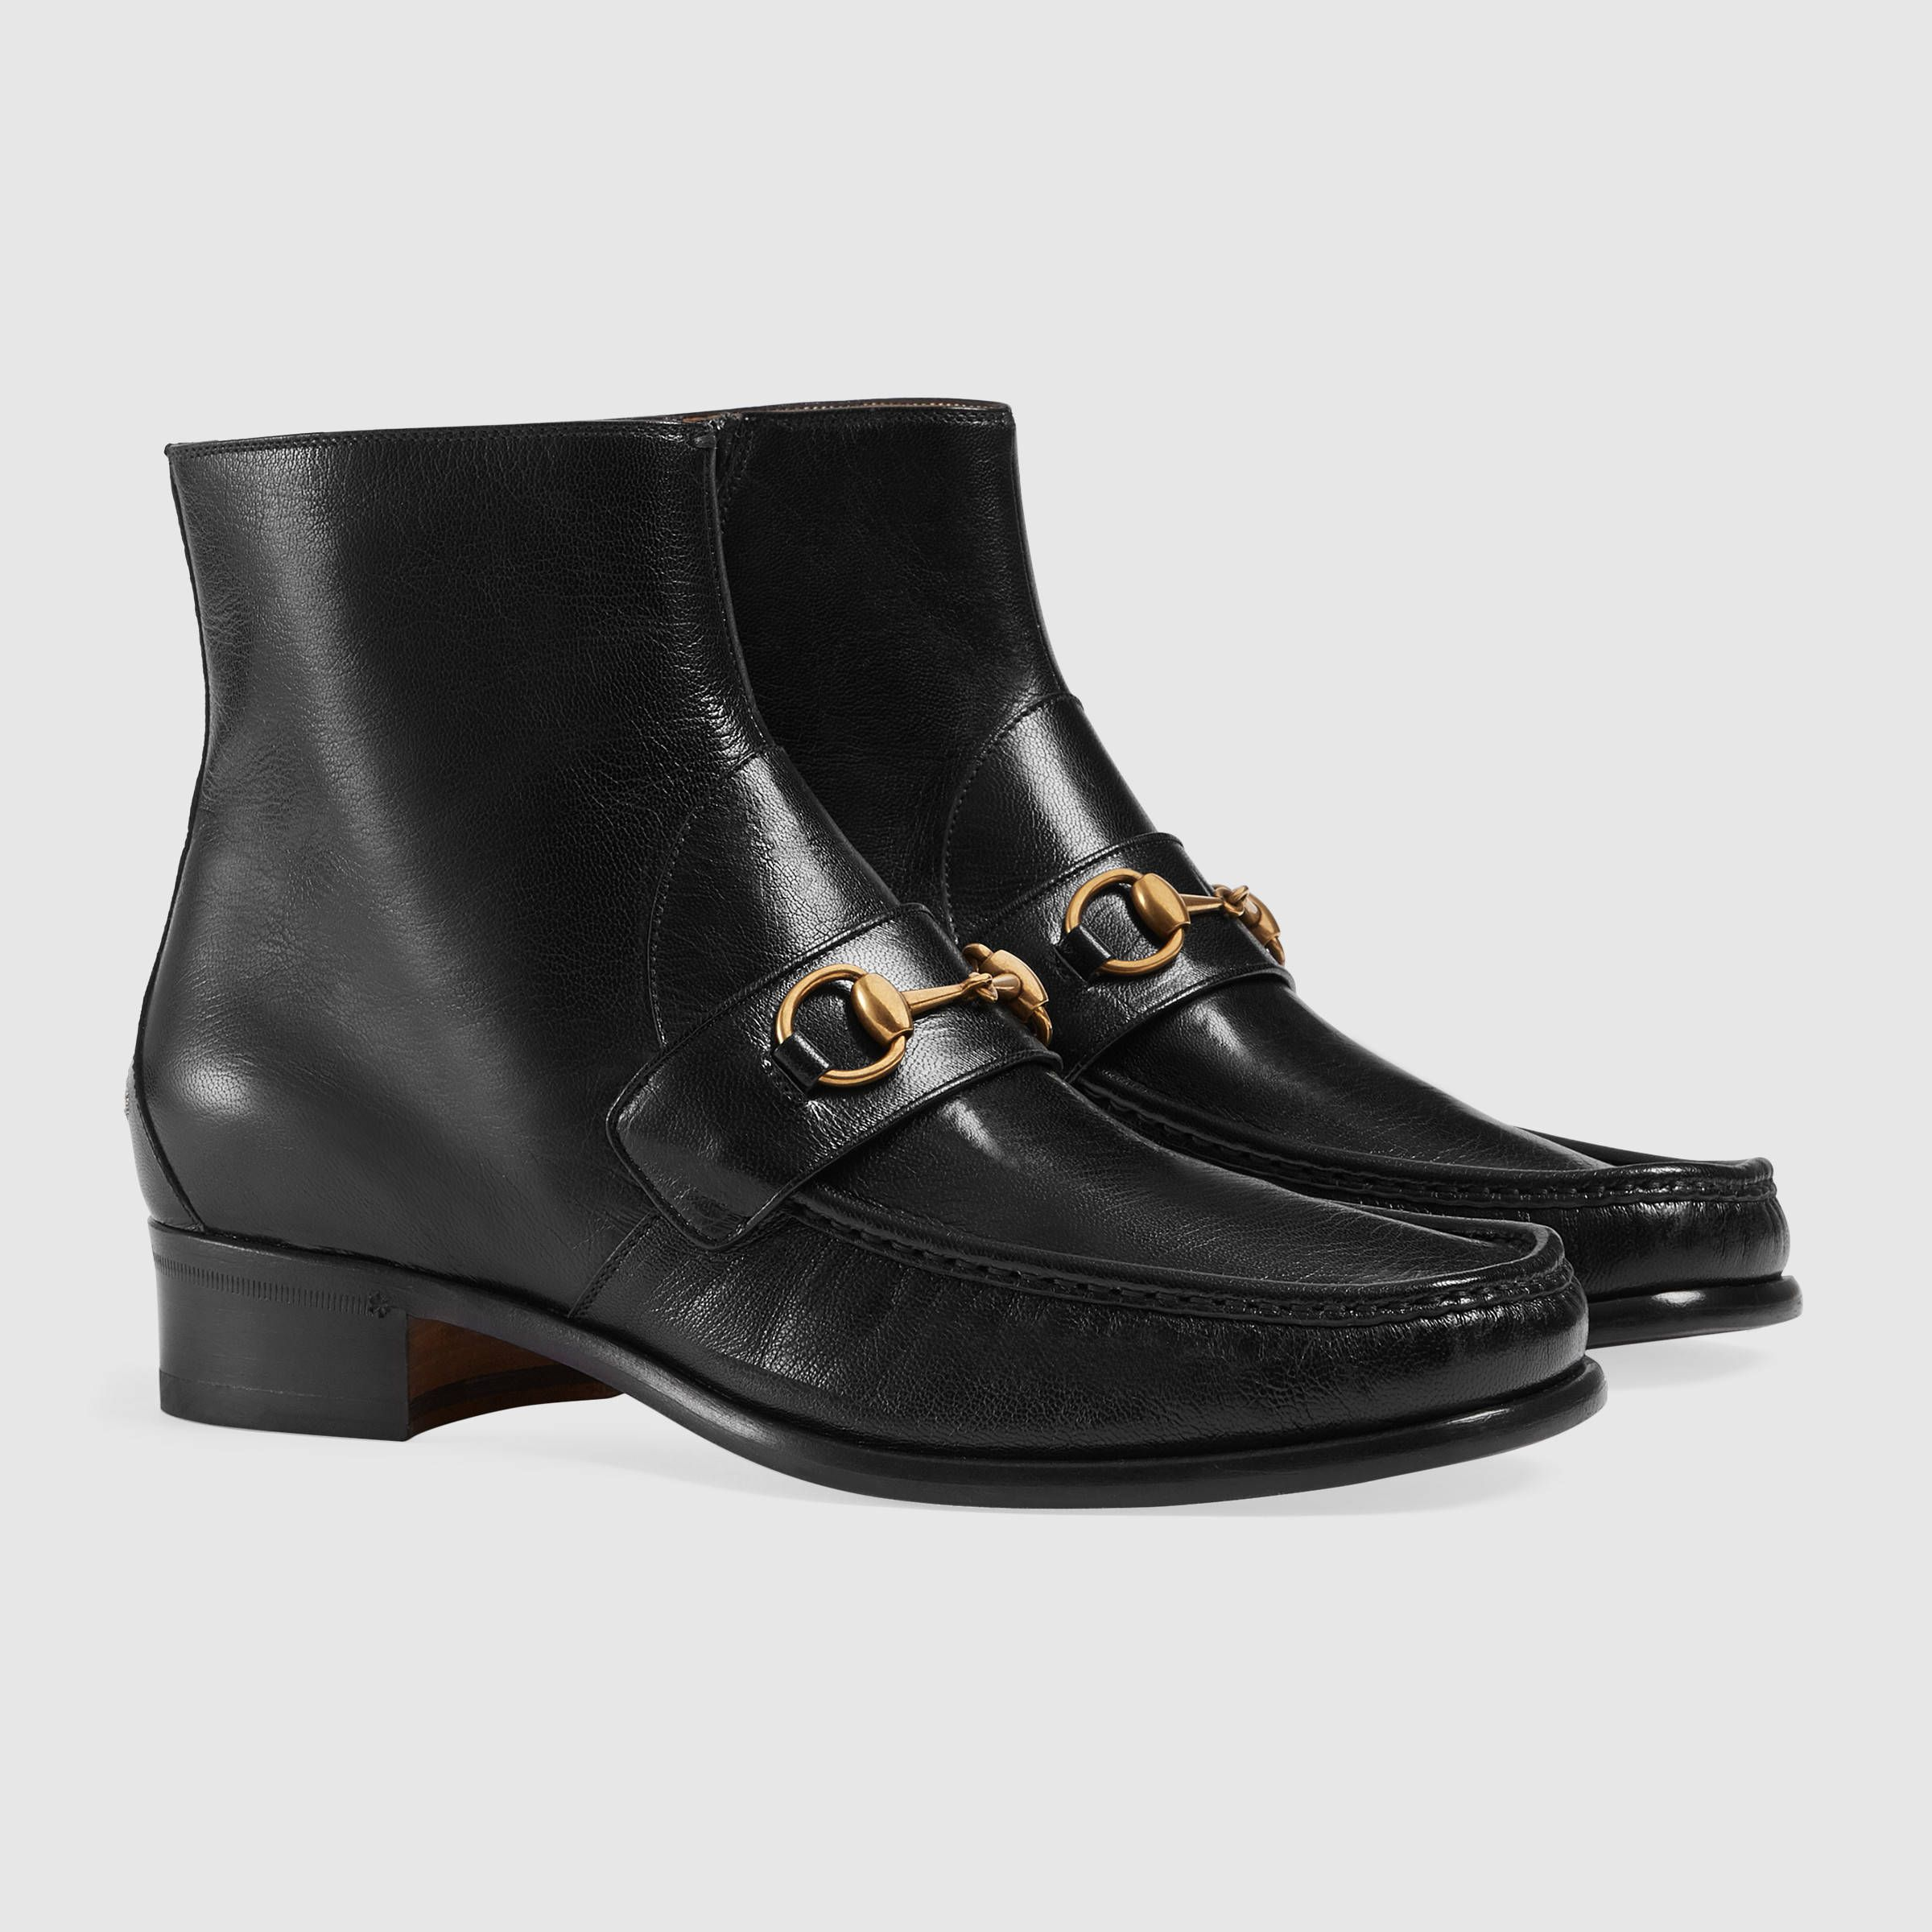 Gucci Horsebit leather boot VHHUrMyz